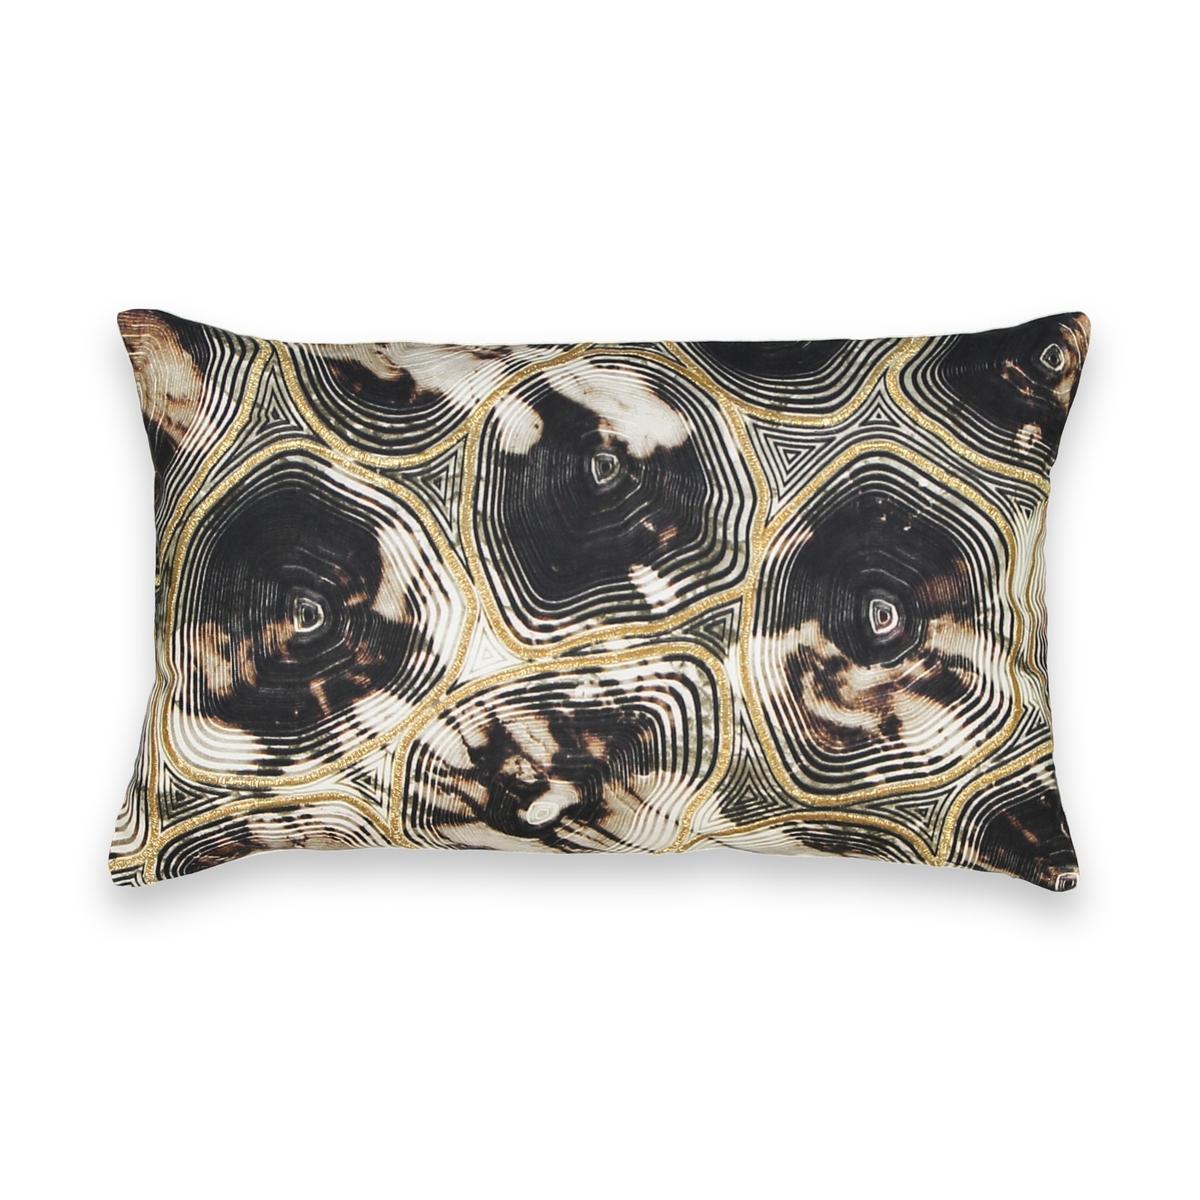 Фото - Чехол на подушку-валик с рисунком агаты, Isdes чехол на подушку валик tasuna